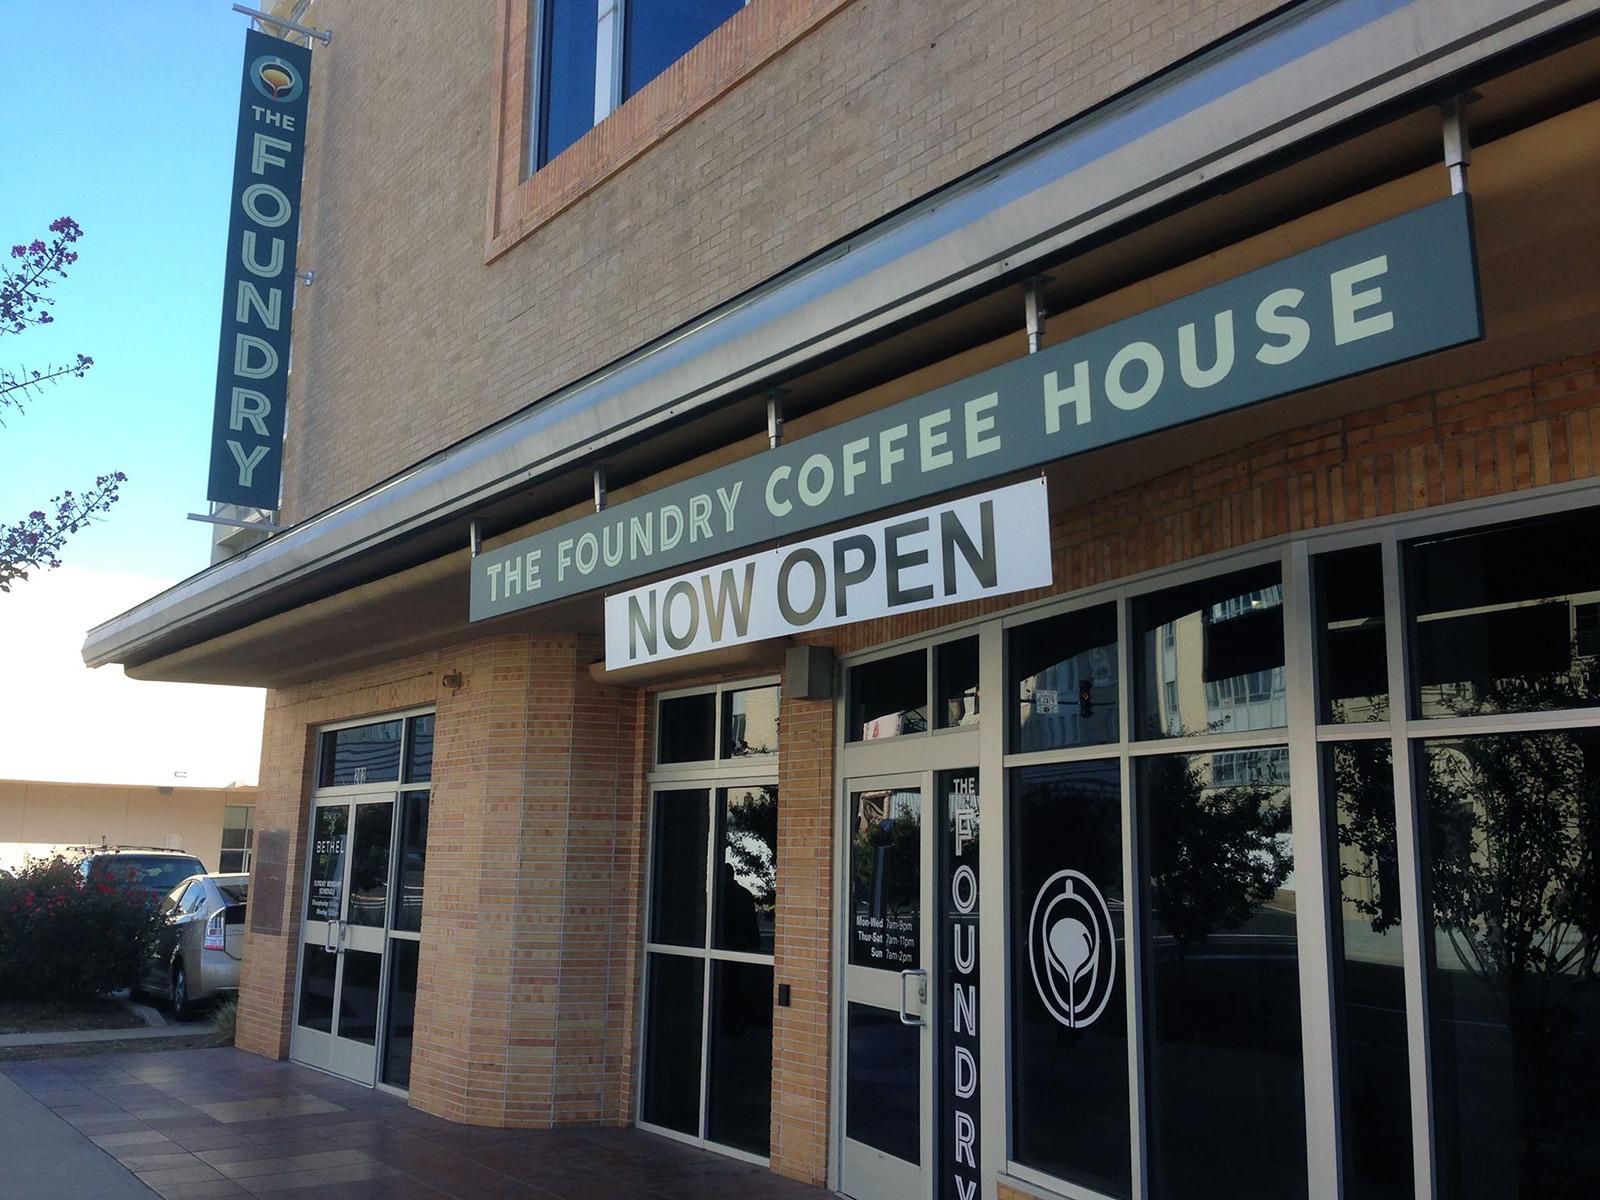 Foundry_Coffee_House_1600.jpg